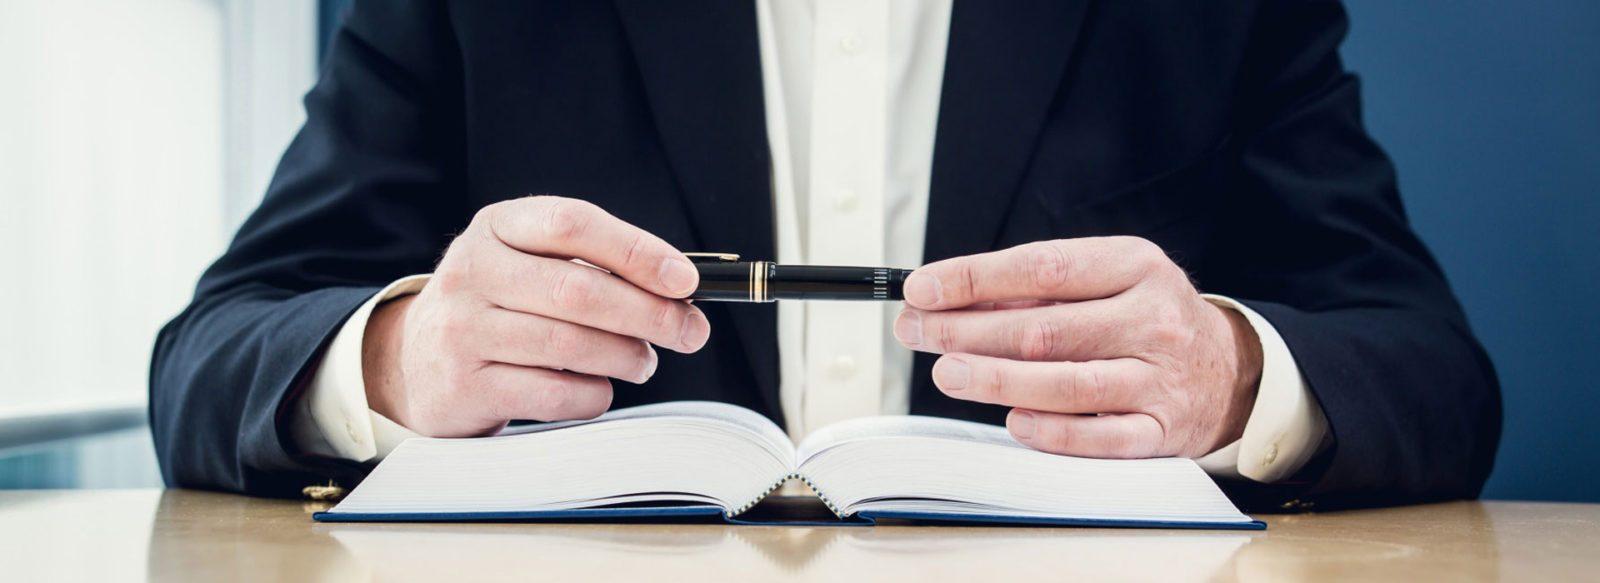 Консультация юриста в Нижневартовске